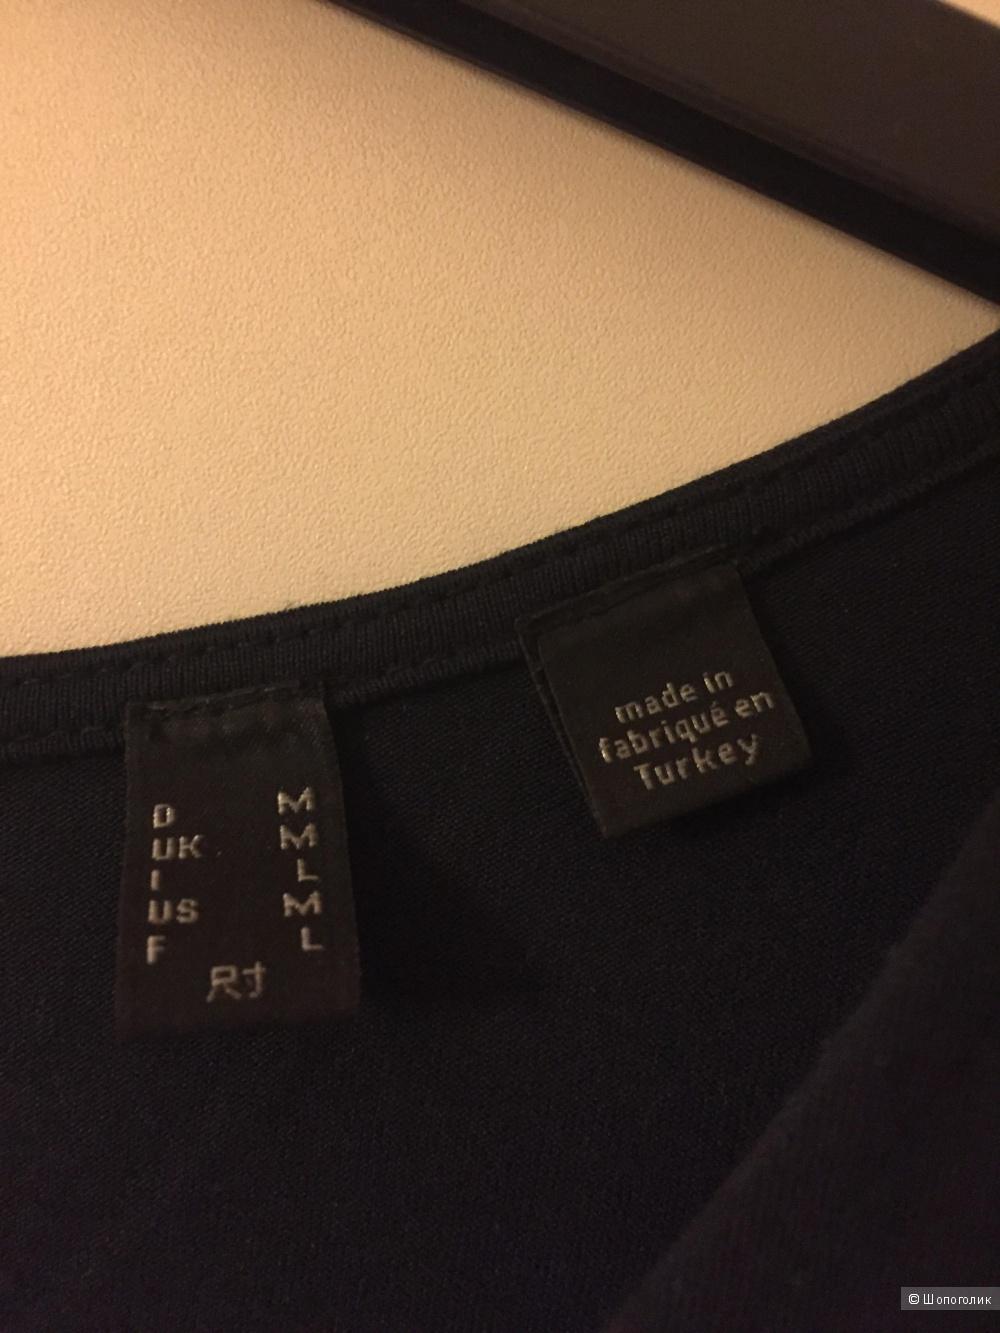 Блузка Esprit на размер М и L.